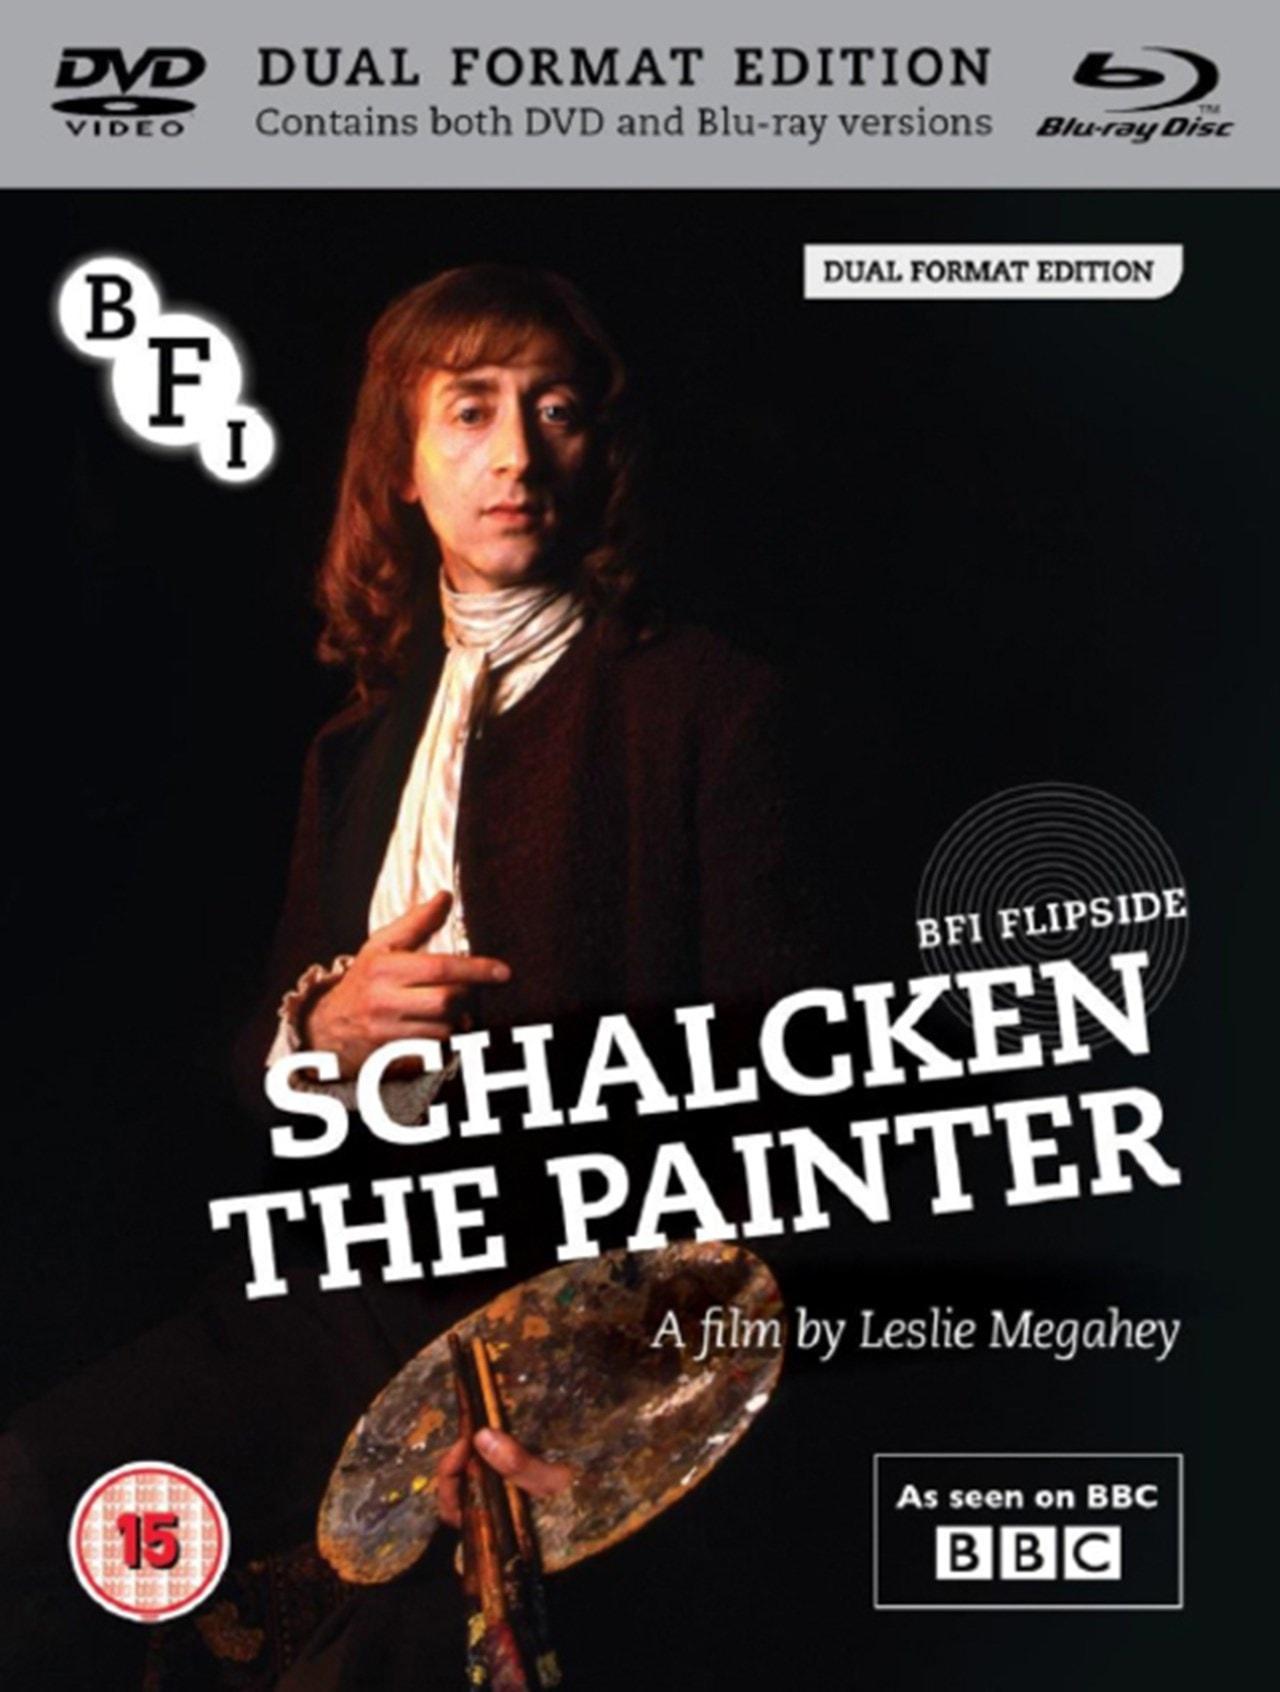 Schalcken the Painter - 1